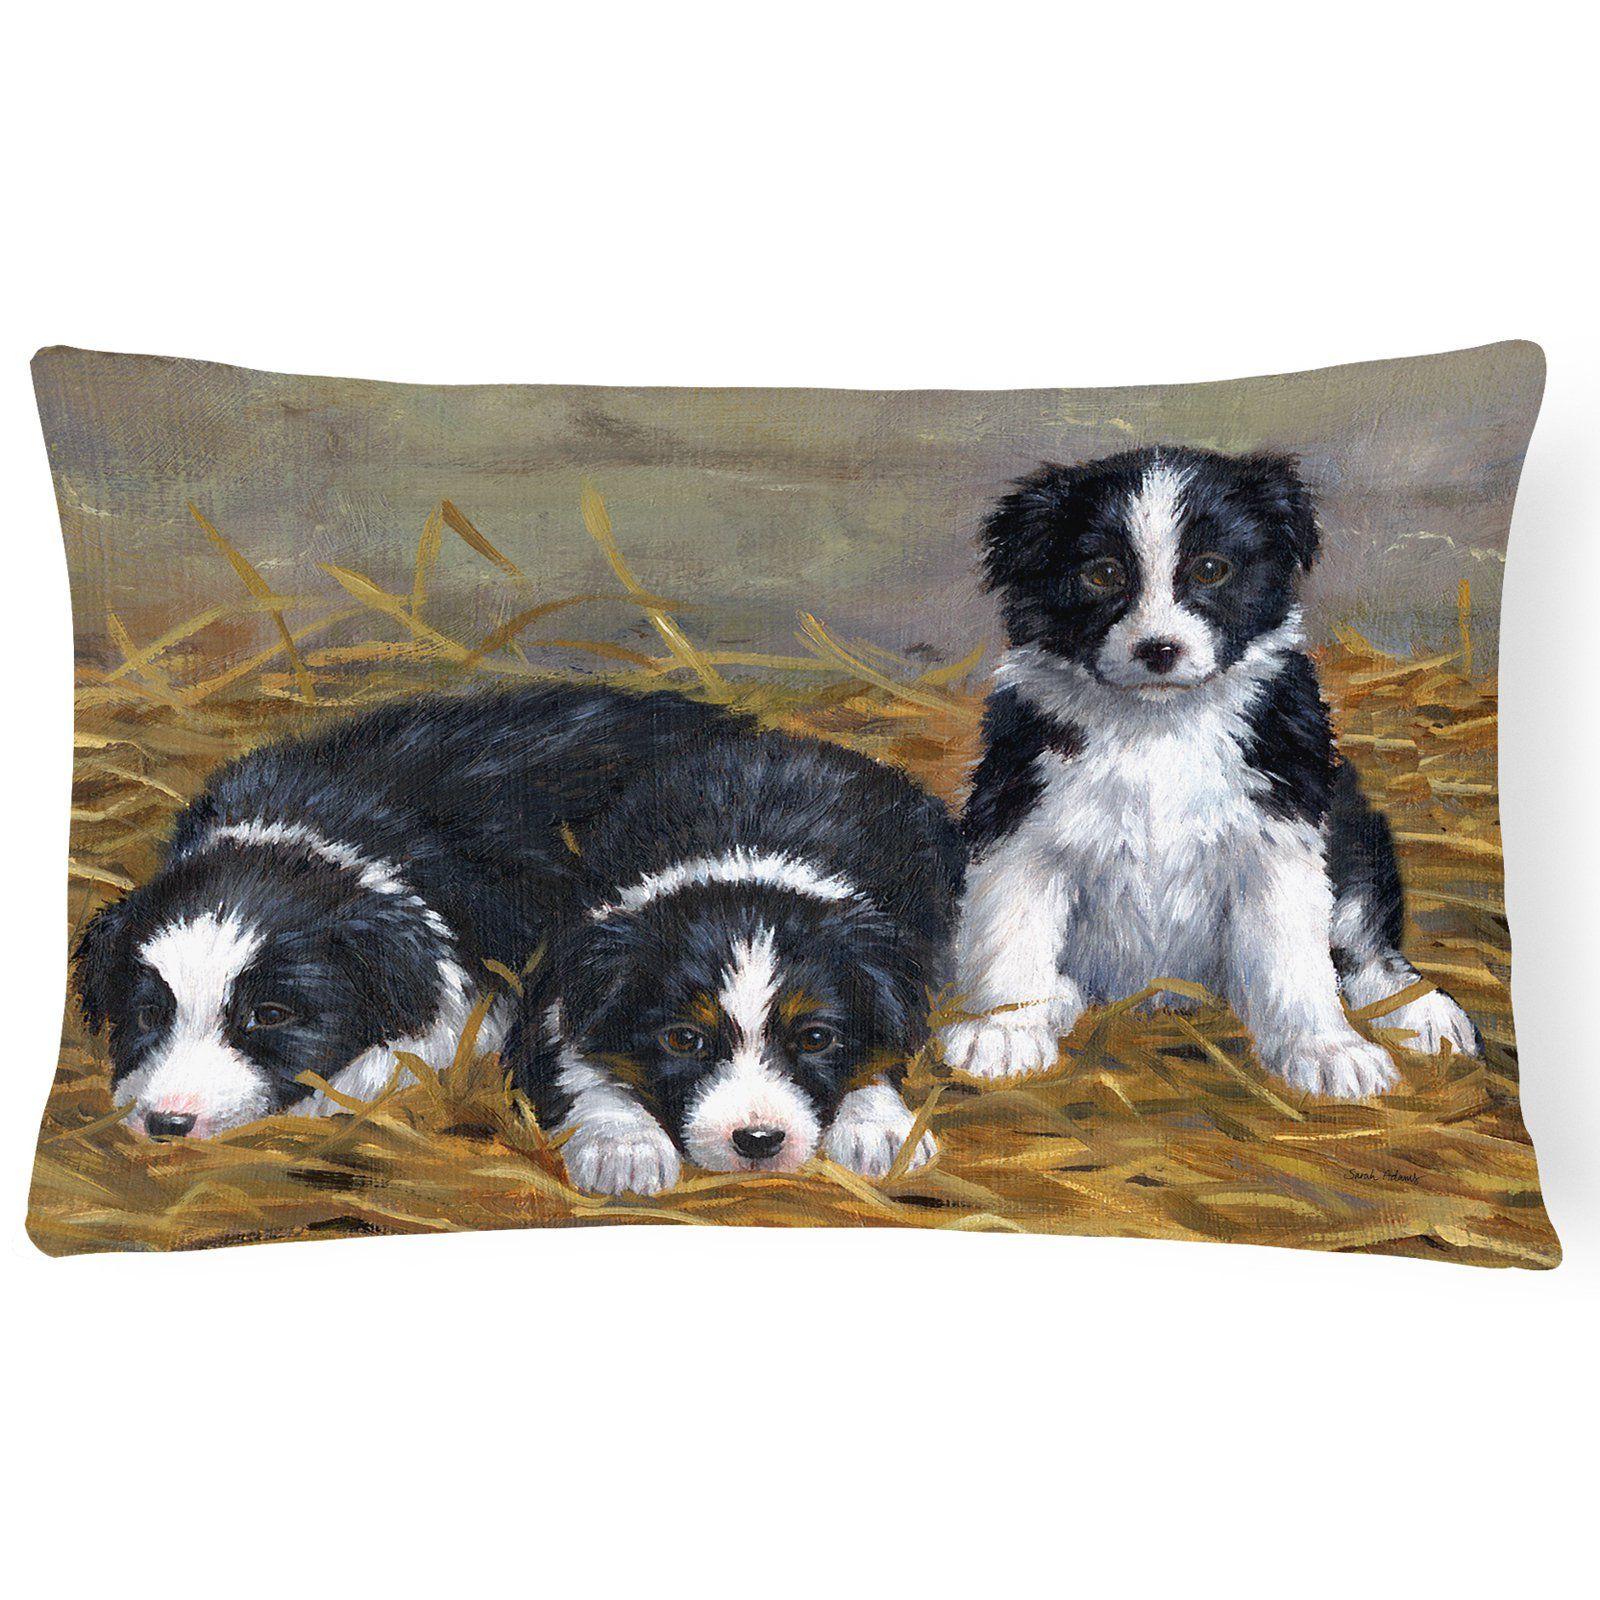 Carolines Treasures Border Collie Puppies Rectangle Decorative